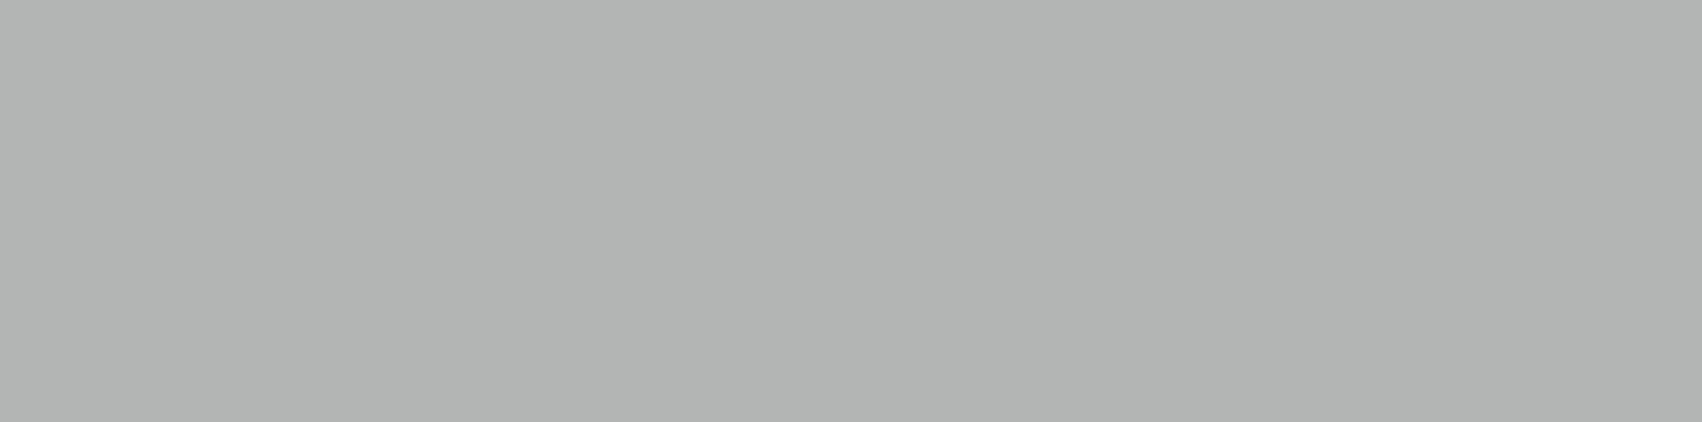 RC_logo_highres-grey copy.png